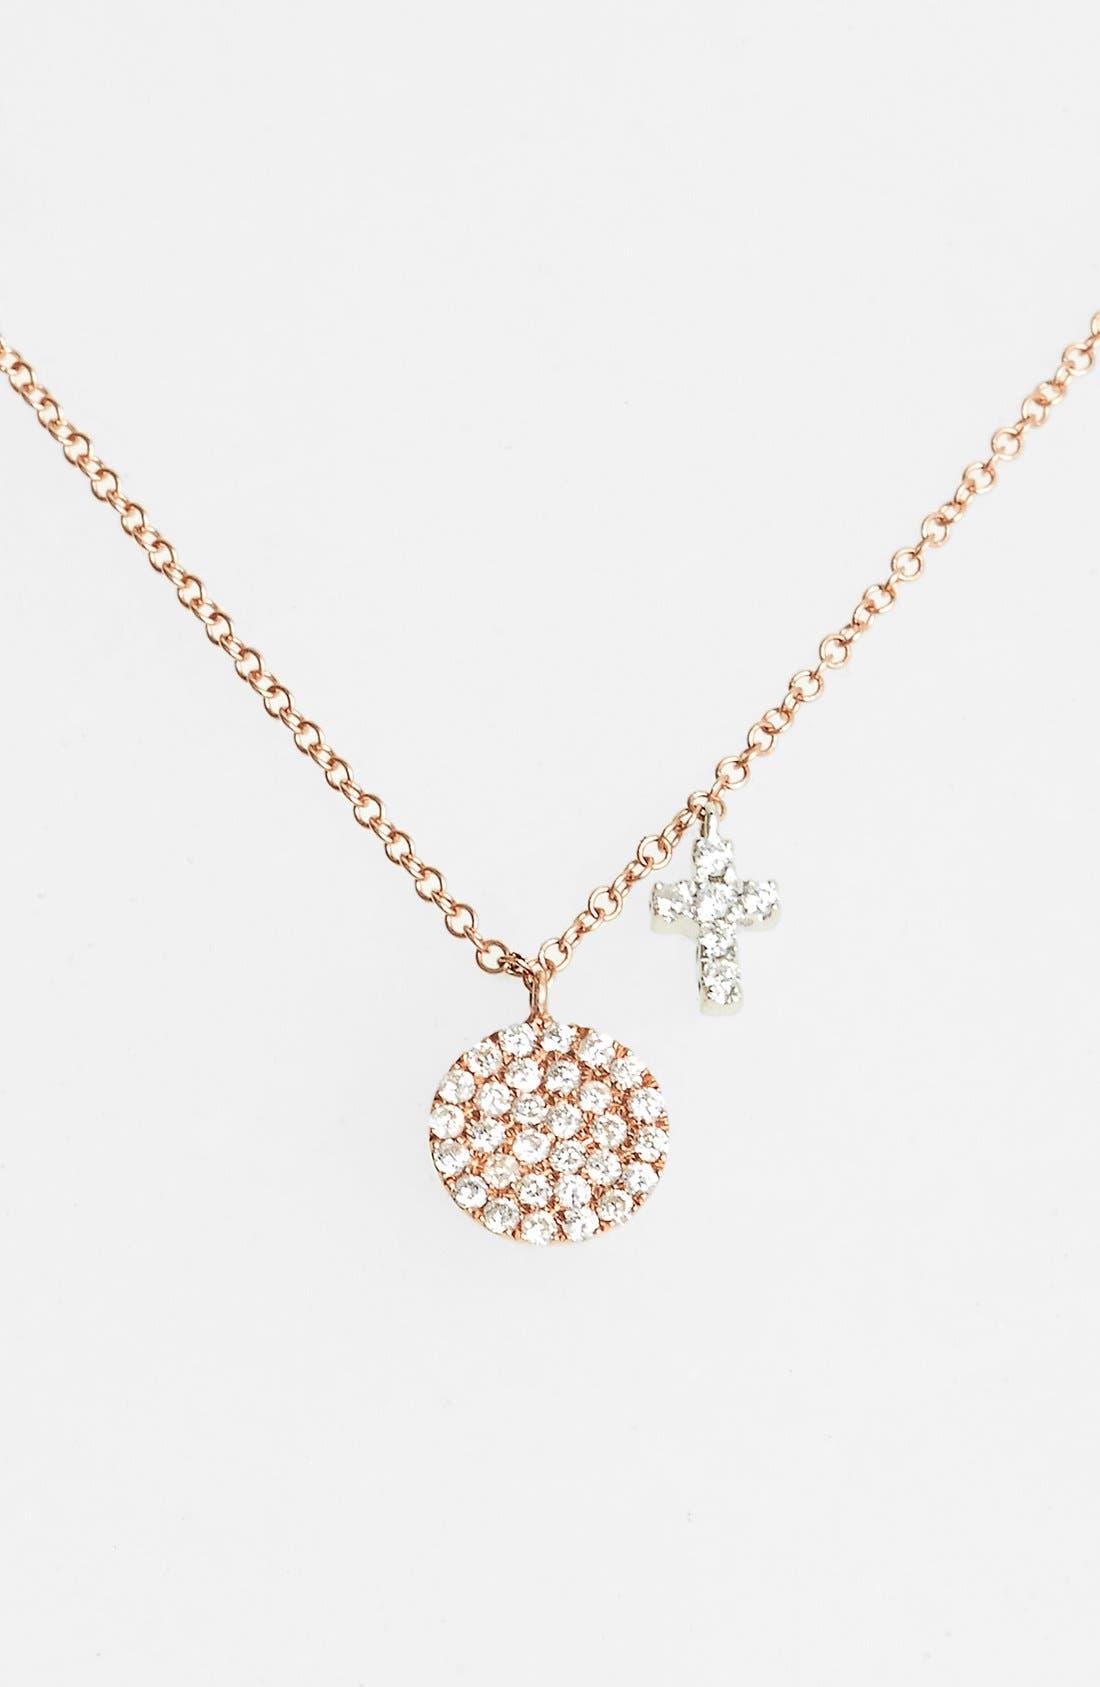 Main Image - MeiraT 'Dazzling' Diamond Disc Pendant Necklace